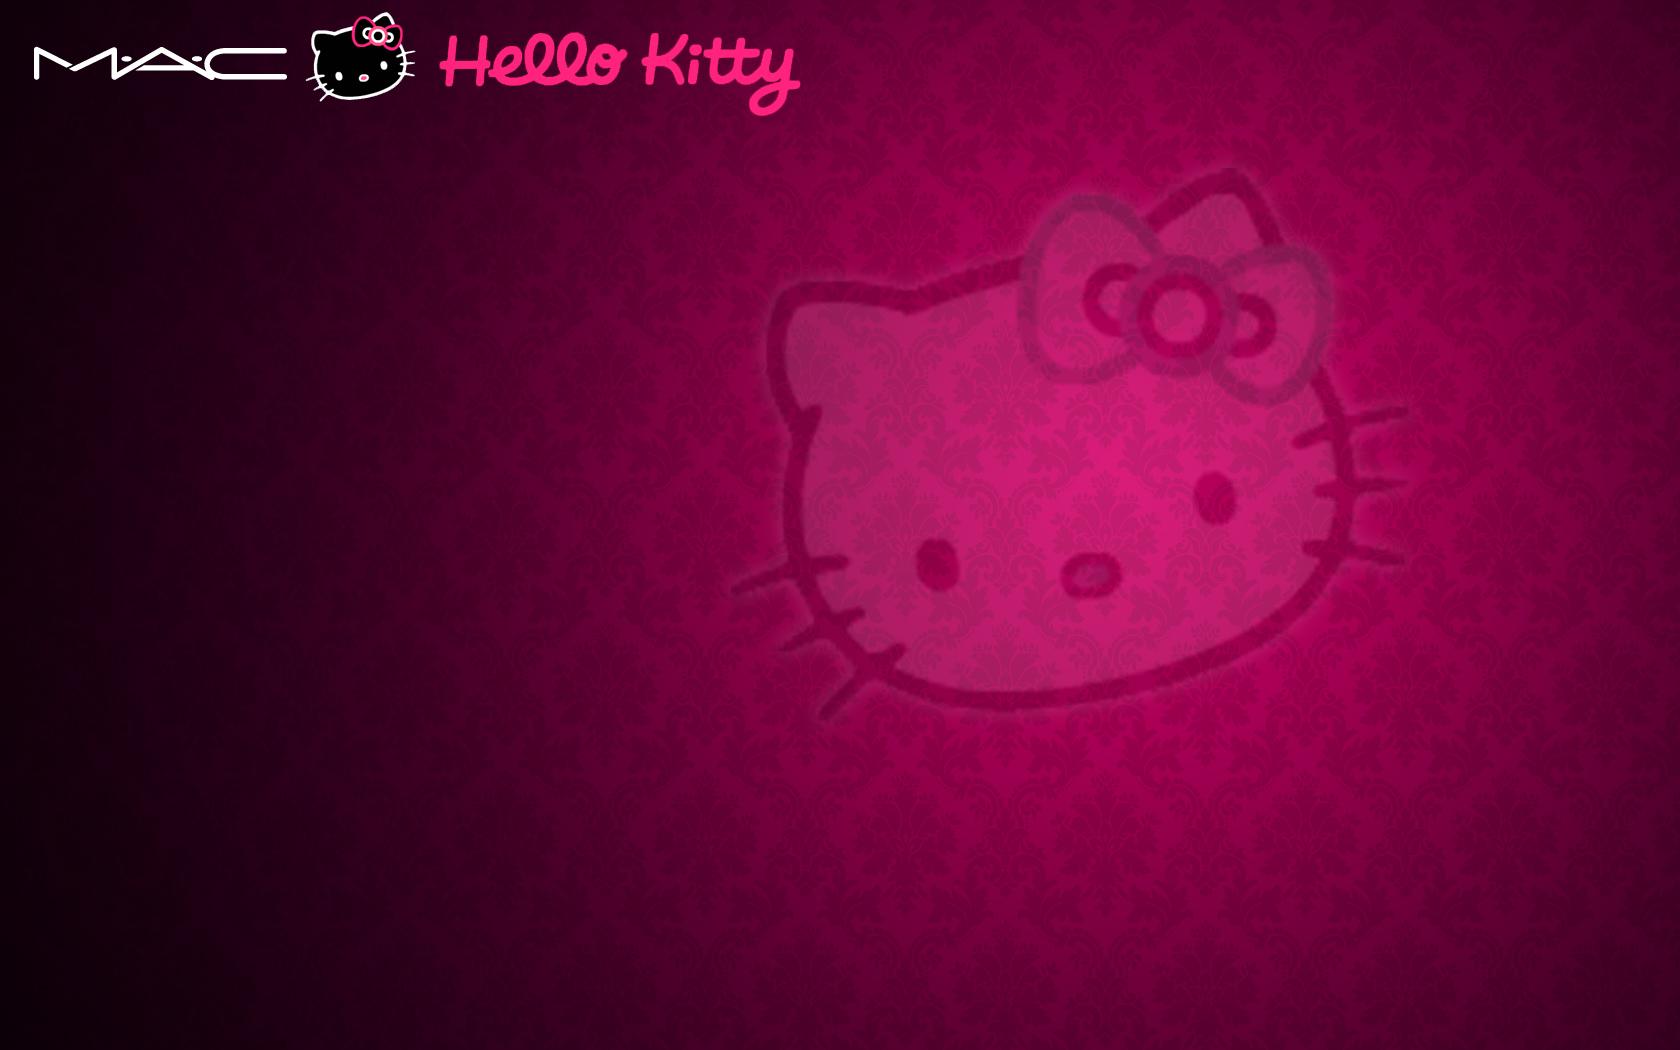 MAC Hello Kitty Wallpaper by angeldust